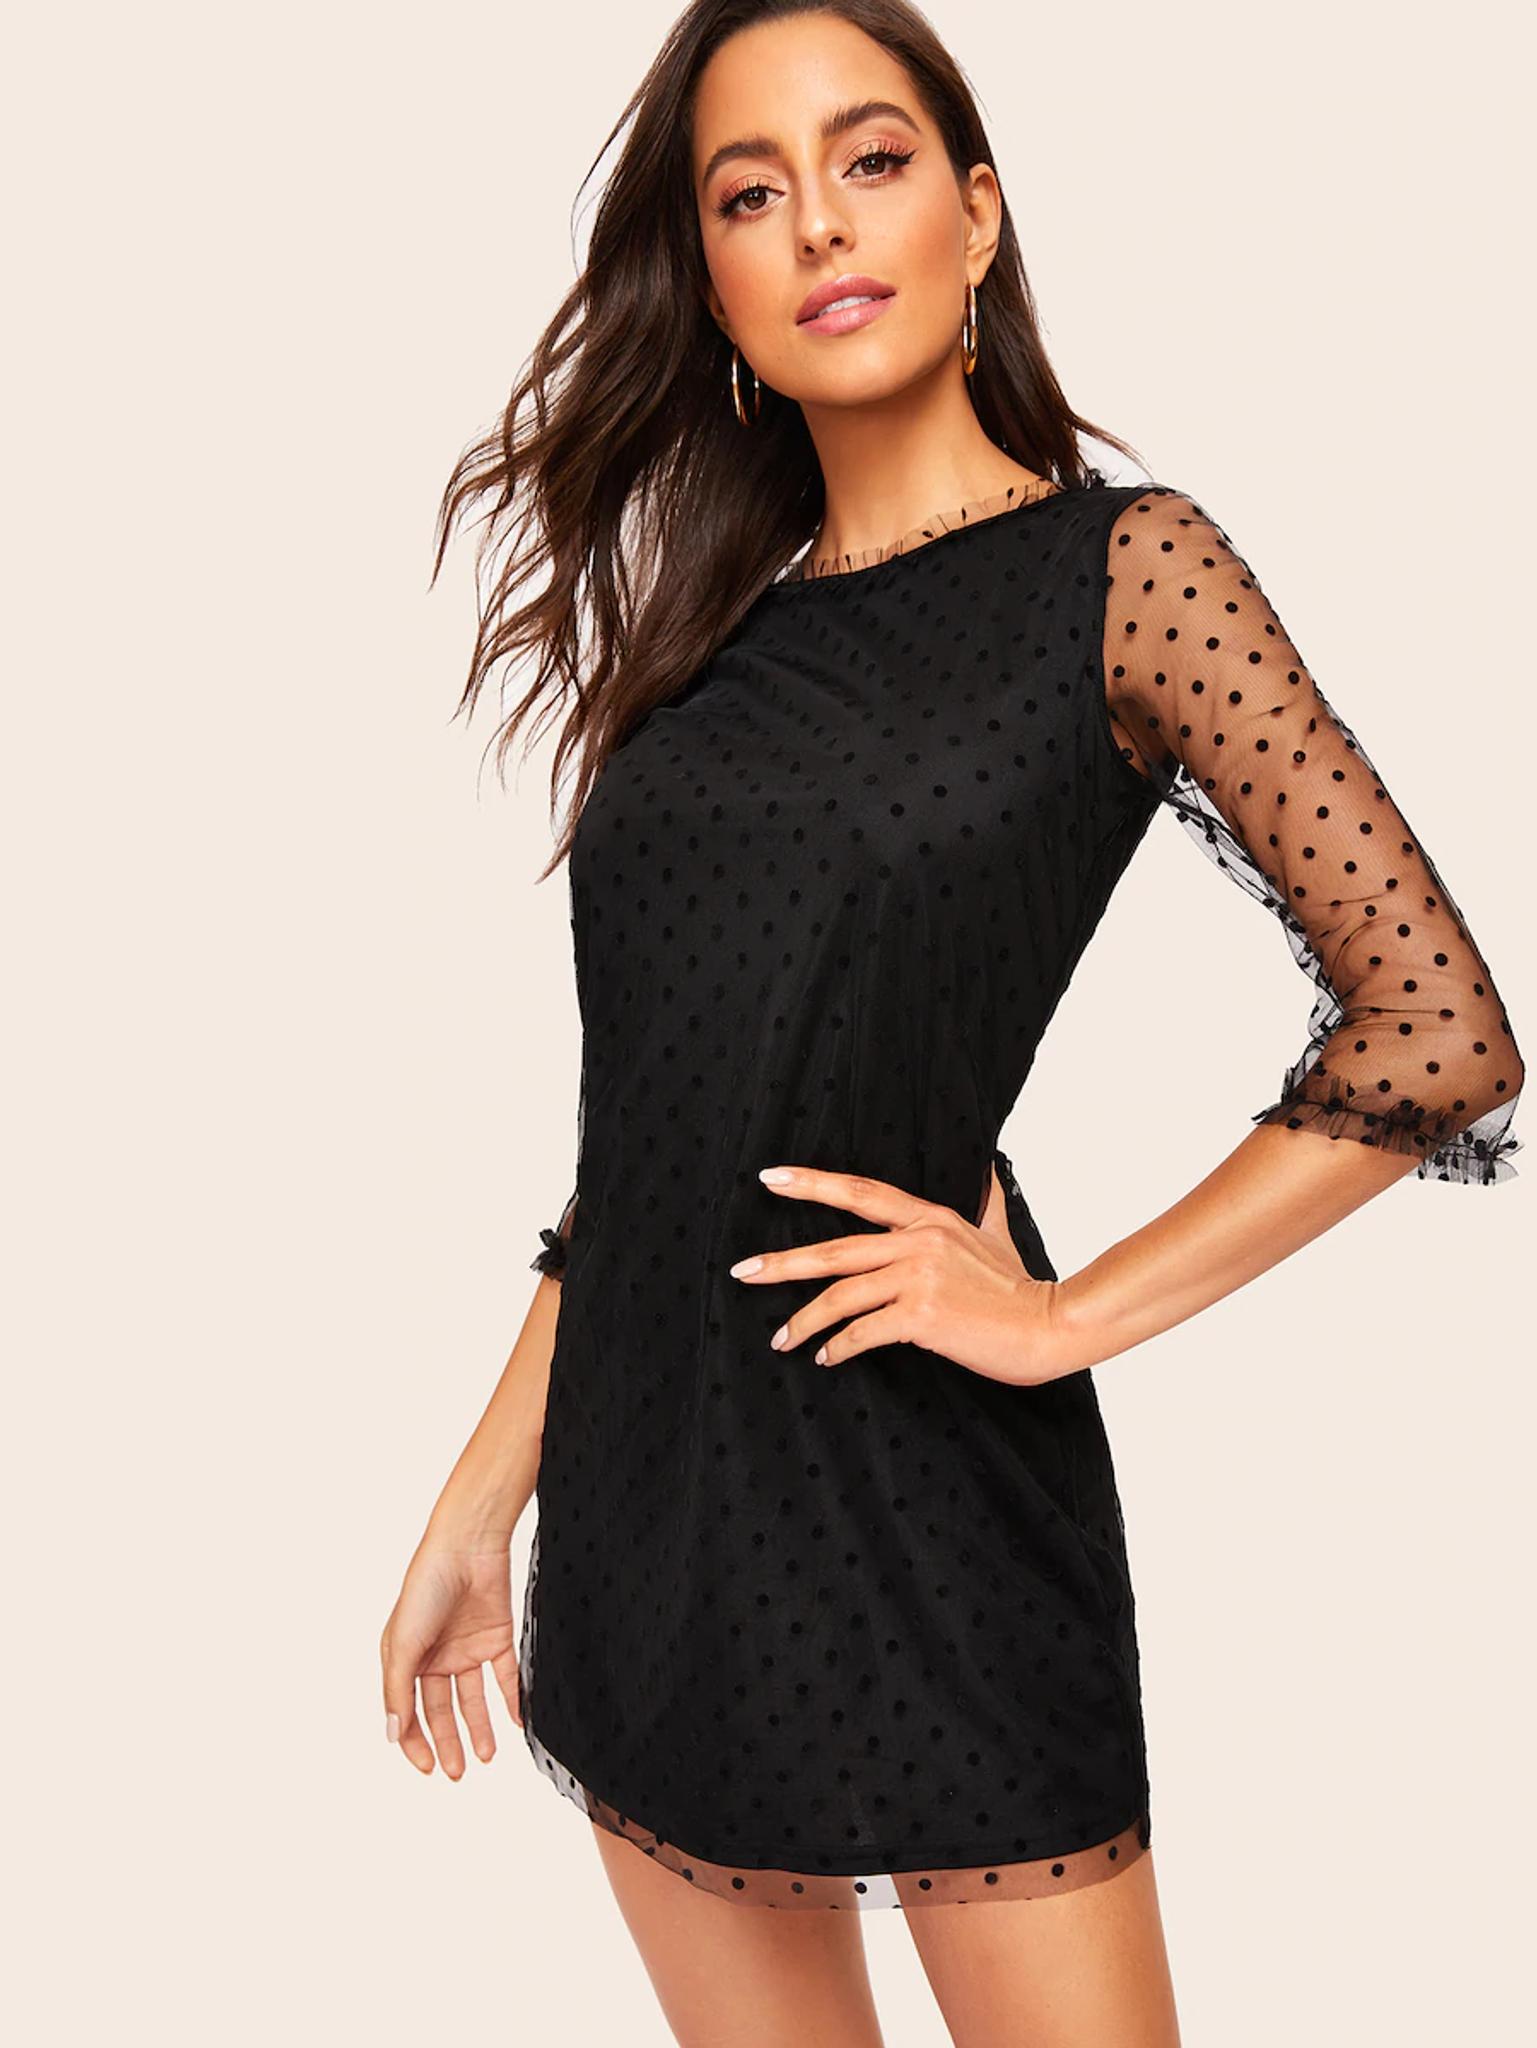 Fifth Avenue Women's UVA1232 Polka Mesh Dot Overlay  Tunic Dress - Black